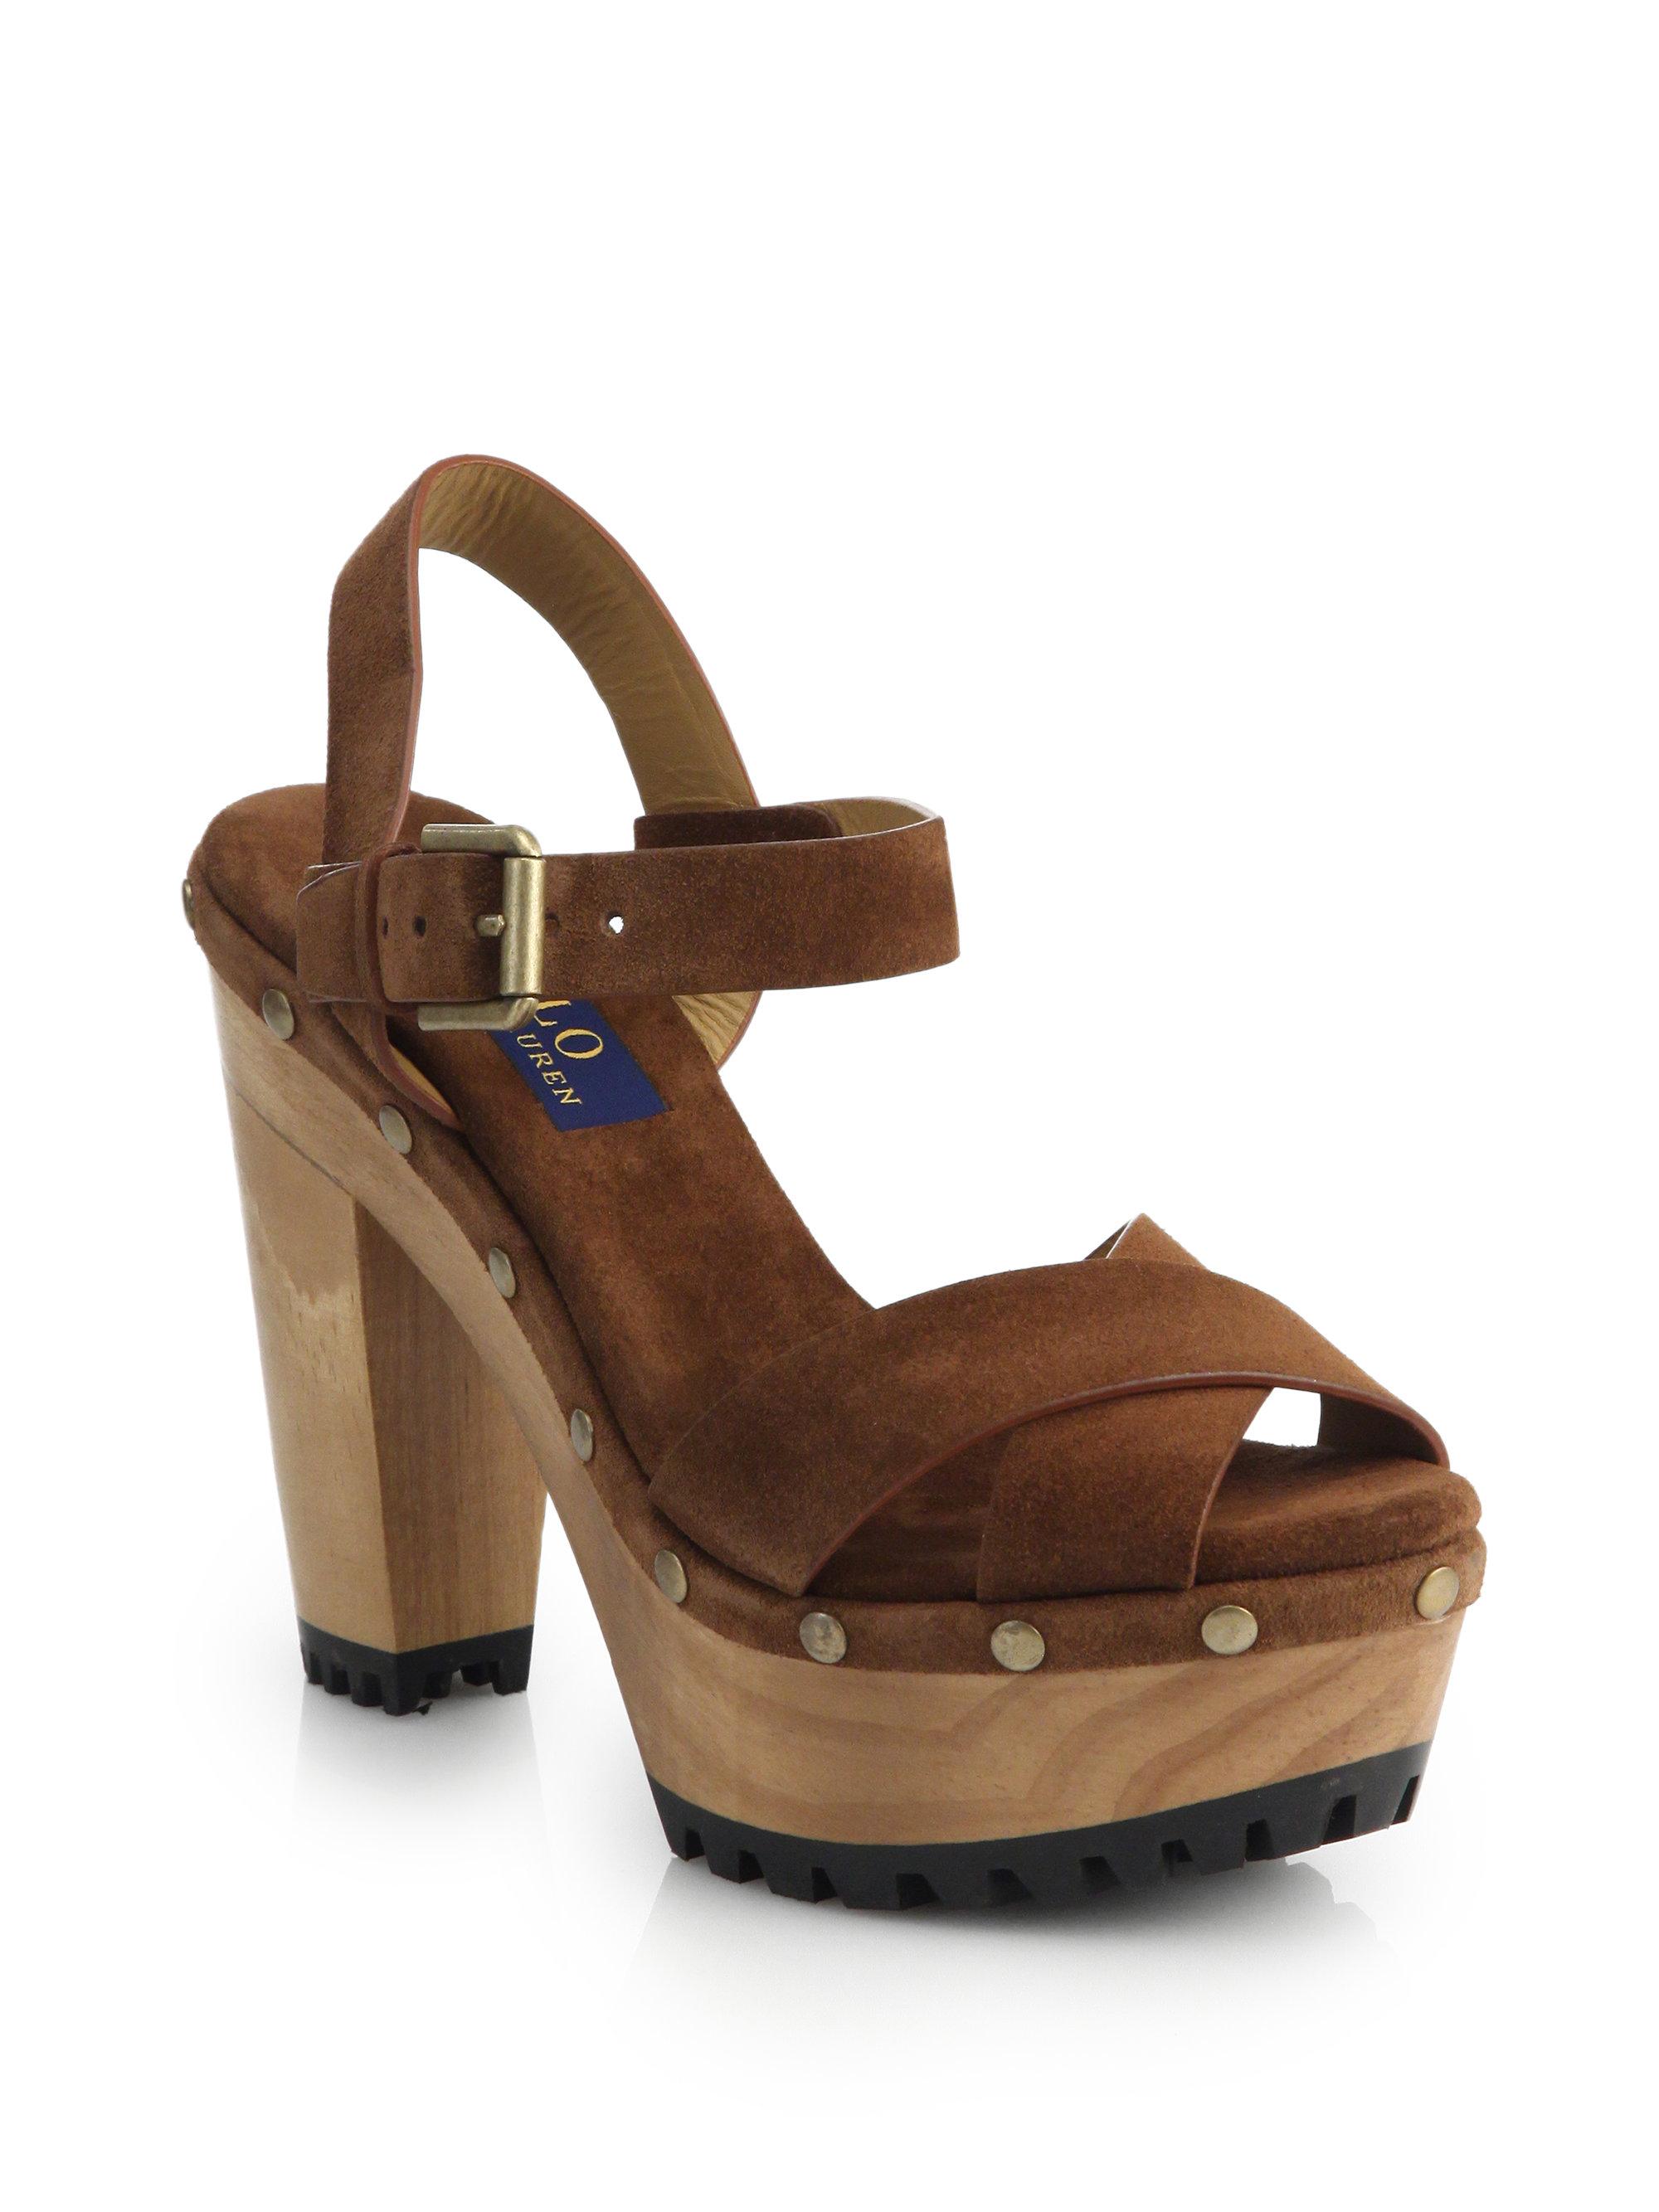 d04347506707 Lyst - Polo Ralph Lauren Lacie Clog Sandals in Brown